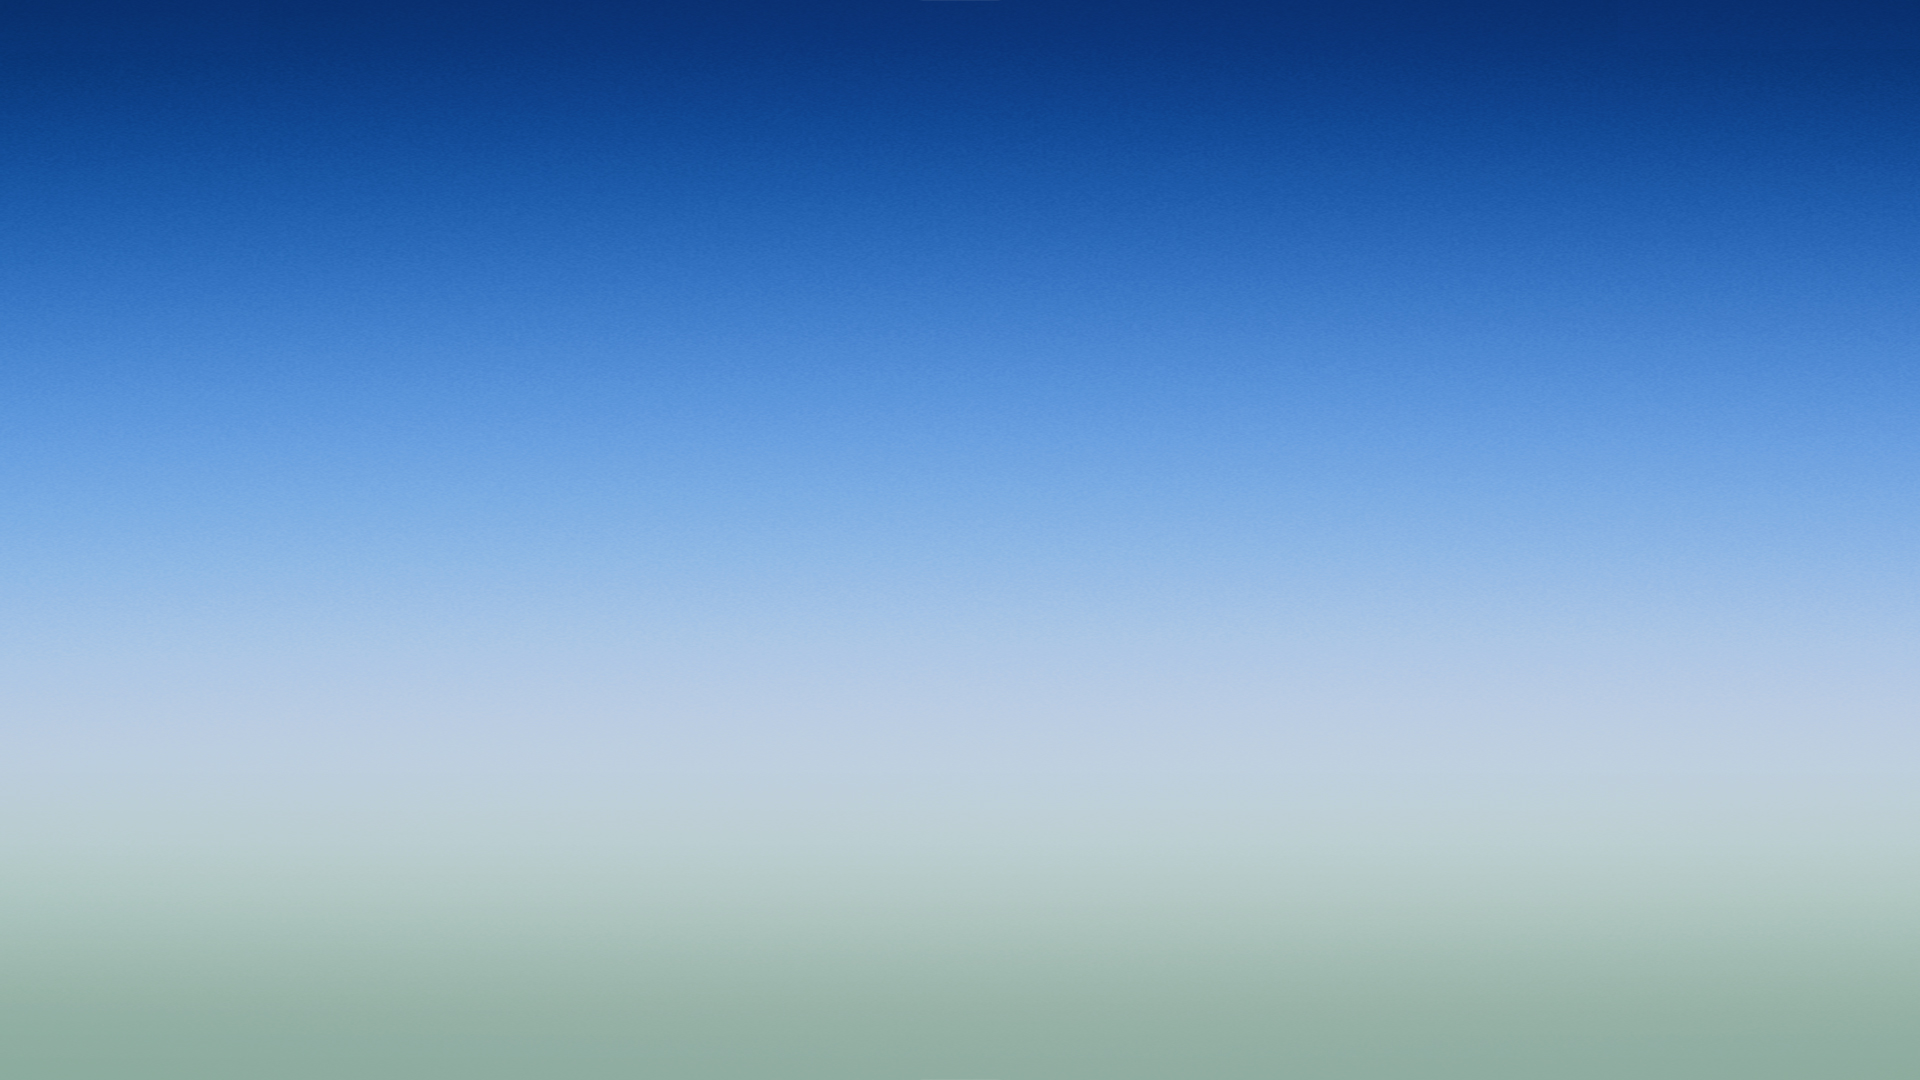 Official Wallpaper Apple iPad Air 2 iMac Retina 5k display 1920x1080